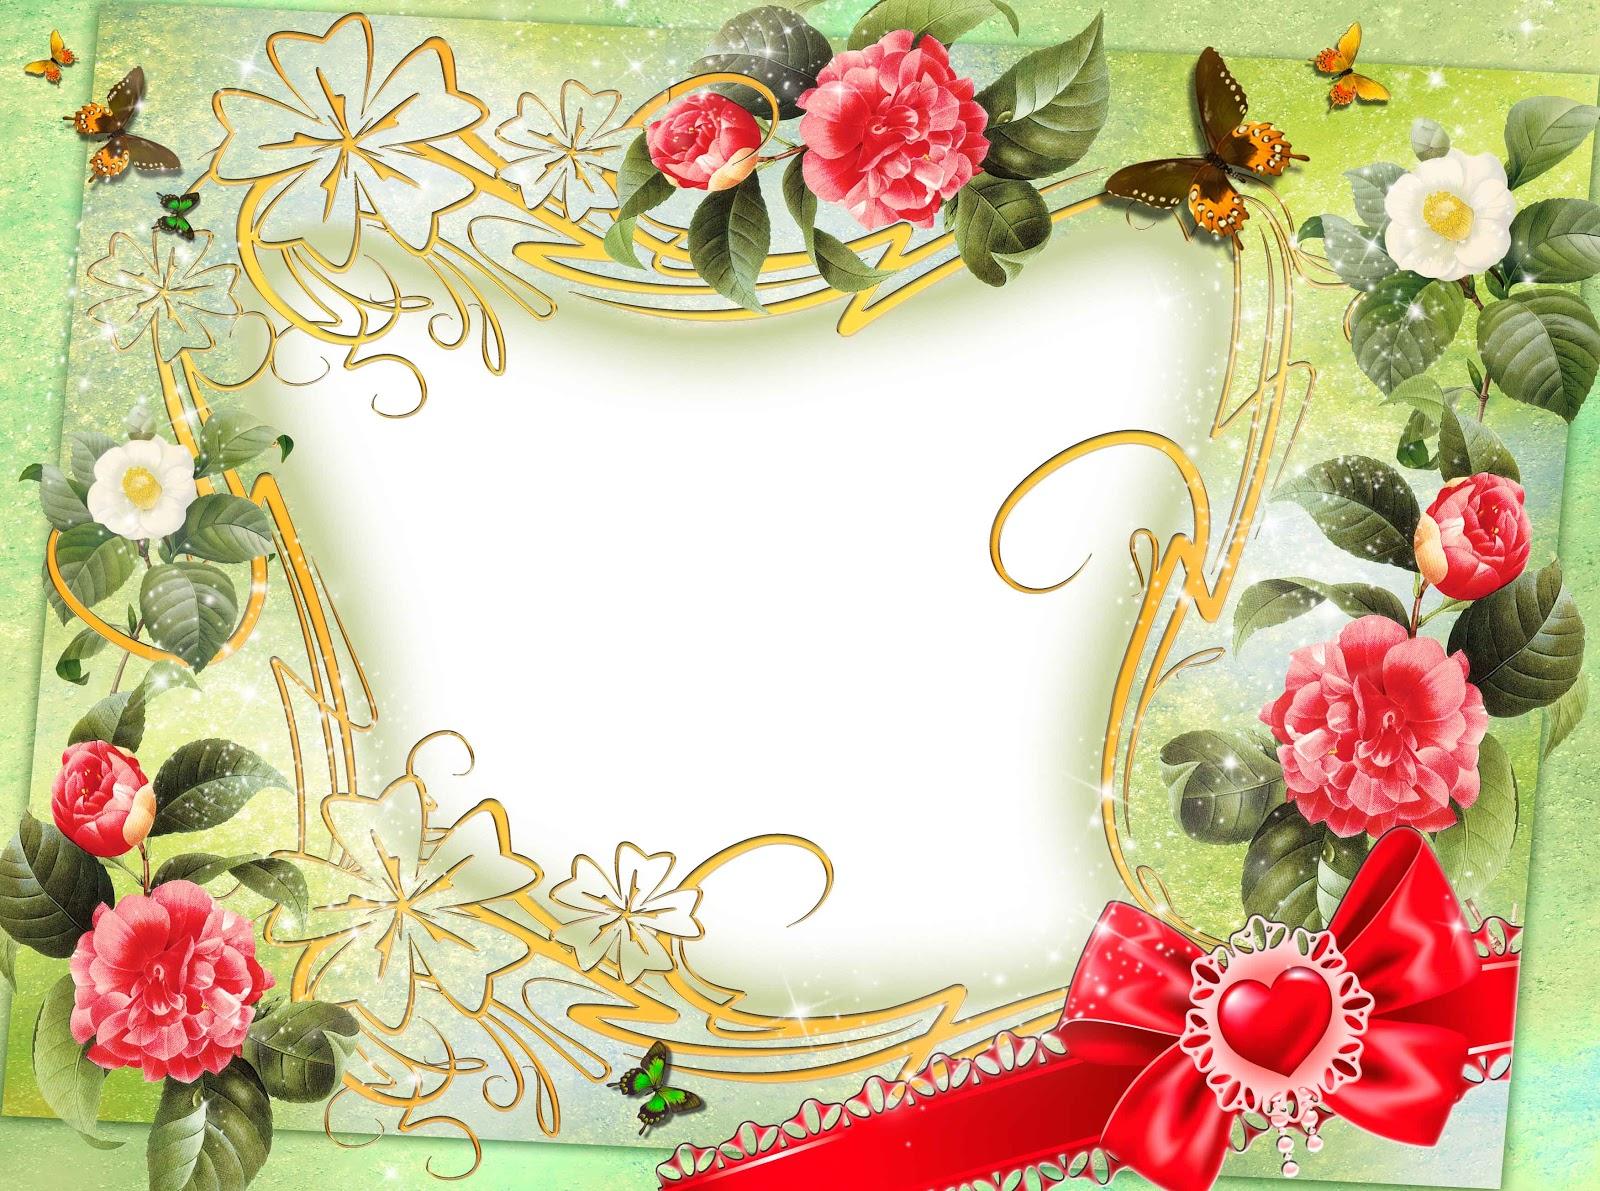 flowers png frame - Download Picture Frames